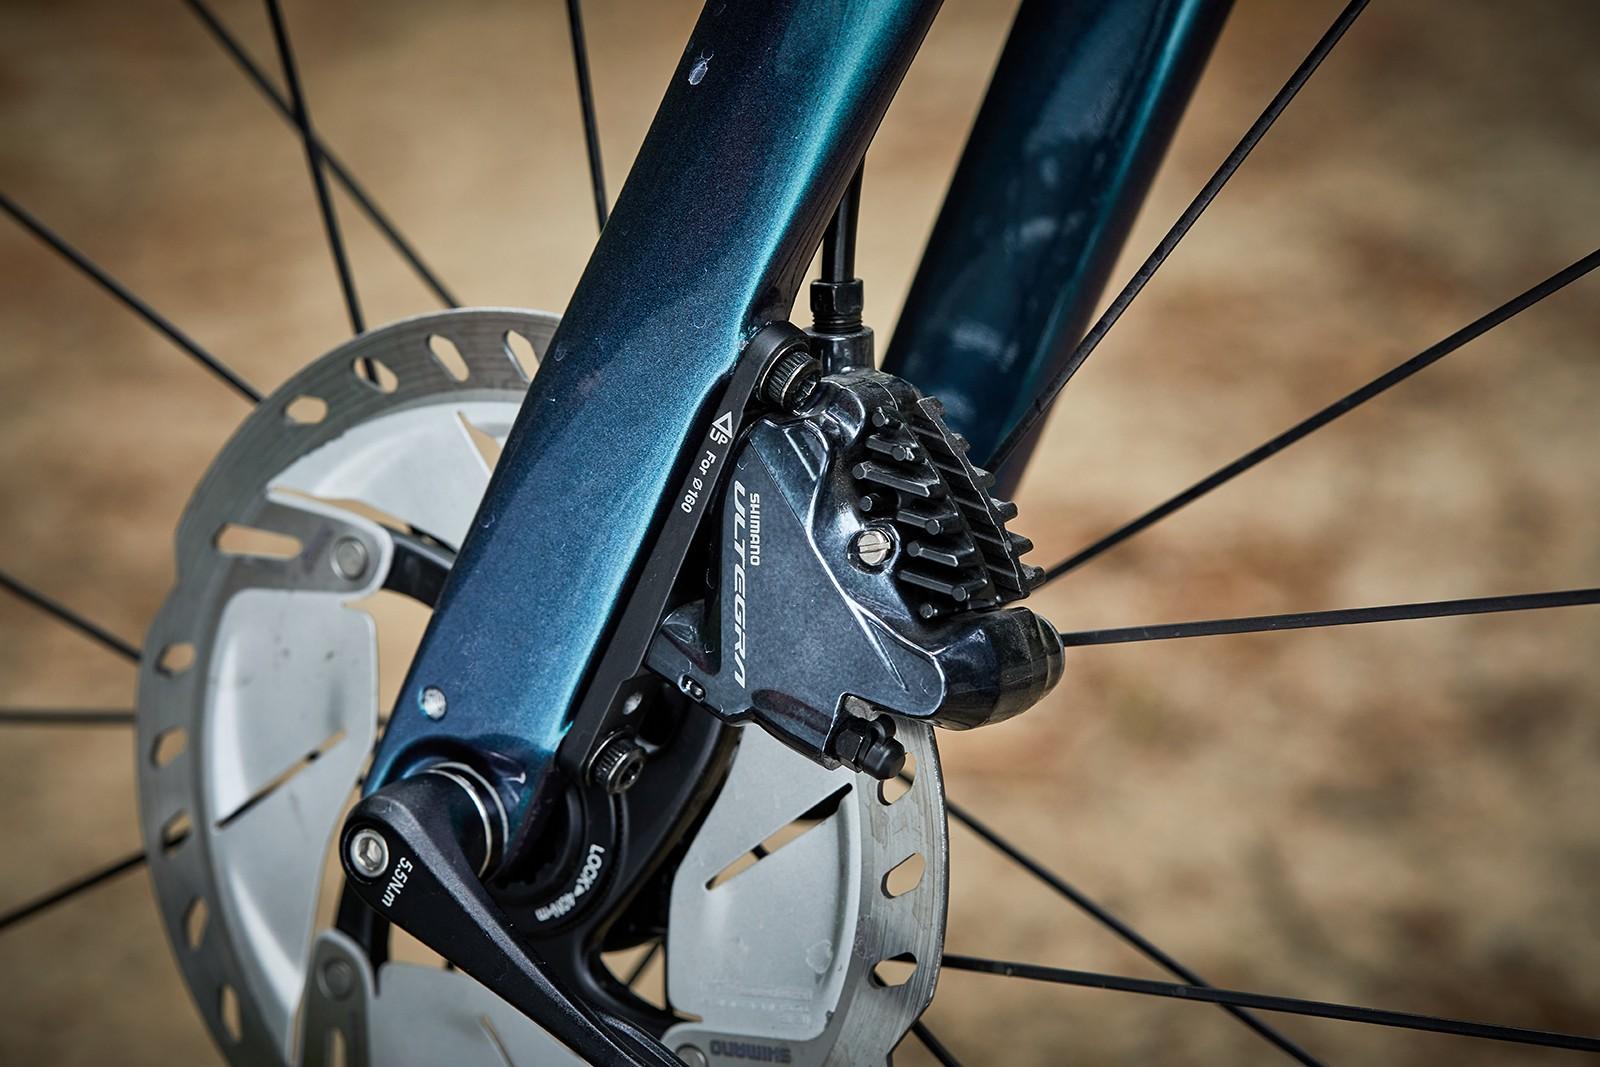 Shimano Ultegra hydraulic disc brakes on the Liv Avail Advanced Pro 2